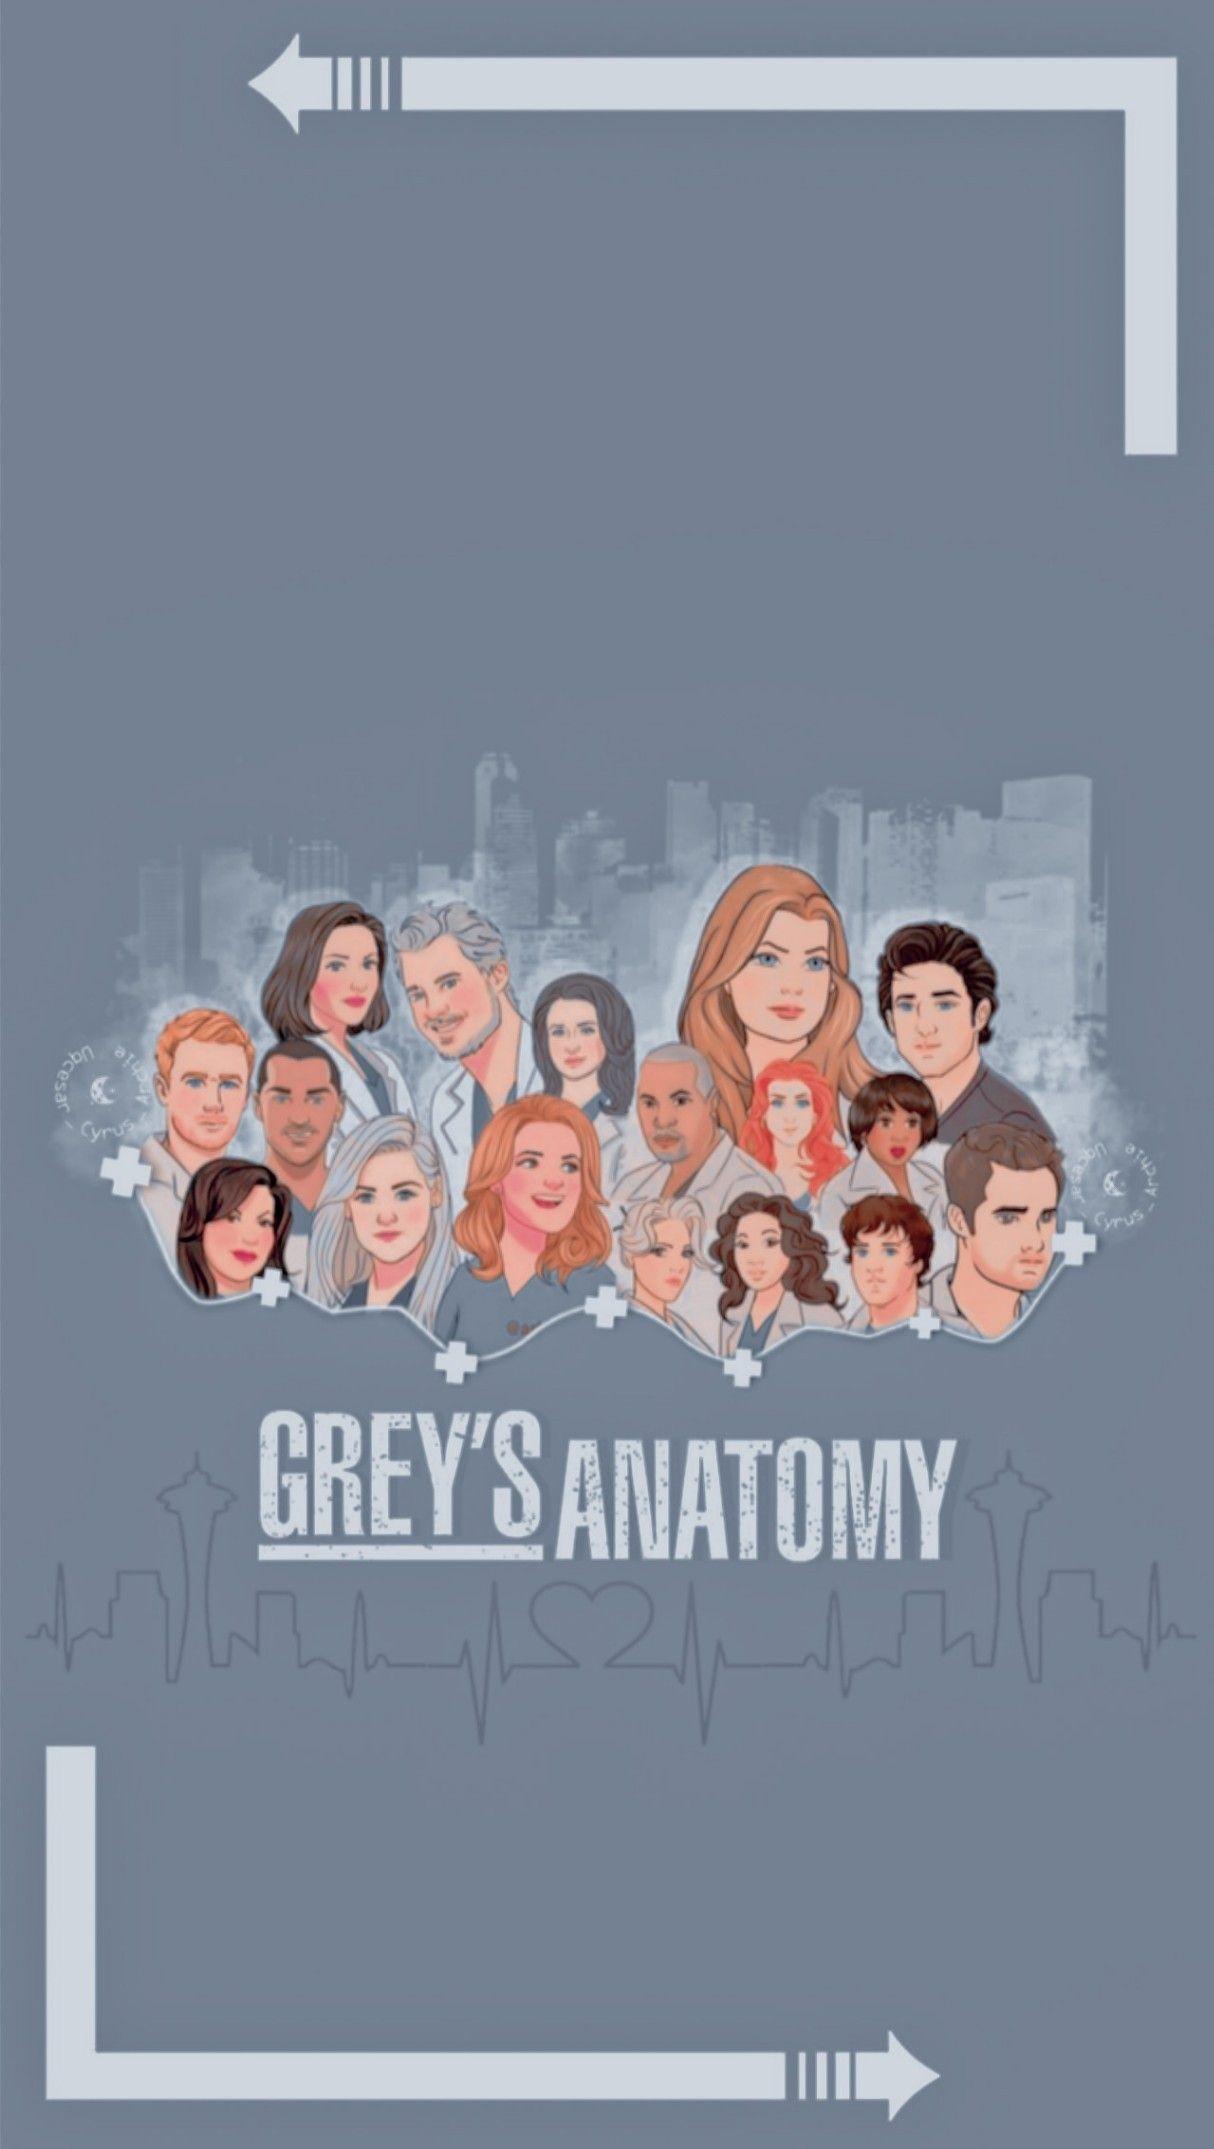 Wallpaper Grey S Anatomy Greys Anatomy Greys Anatomy Characters Greys Anatomy Funny